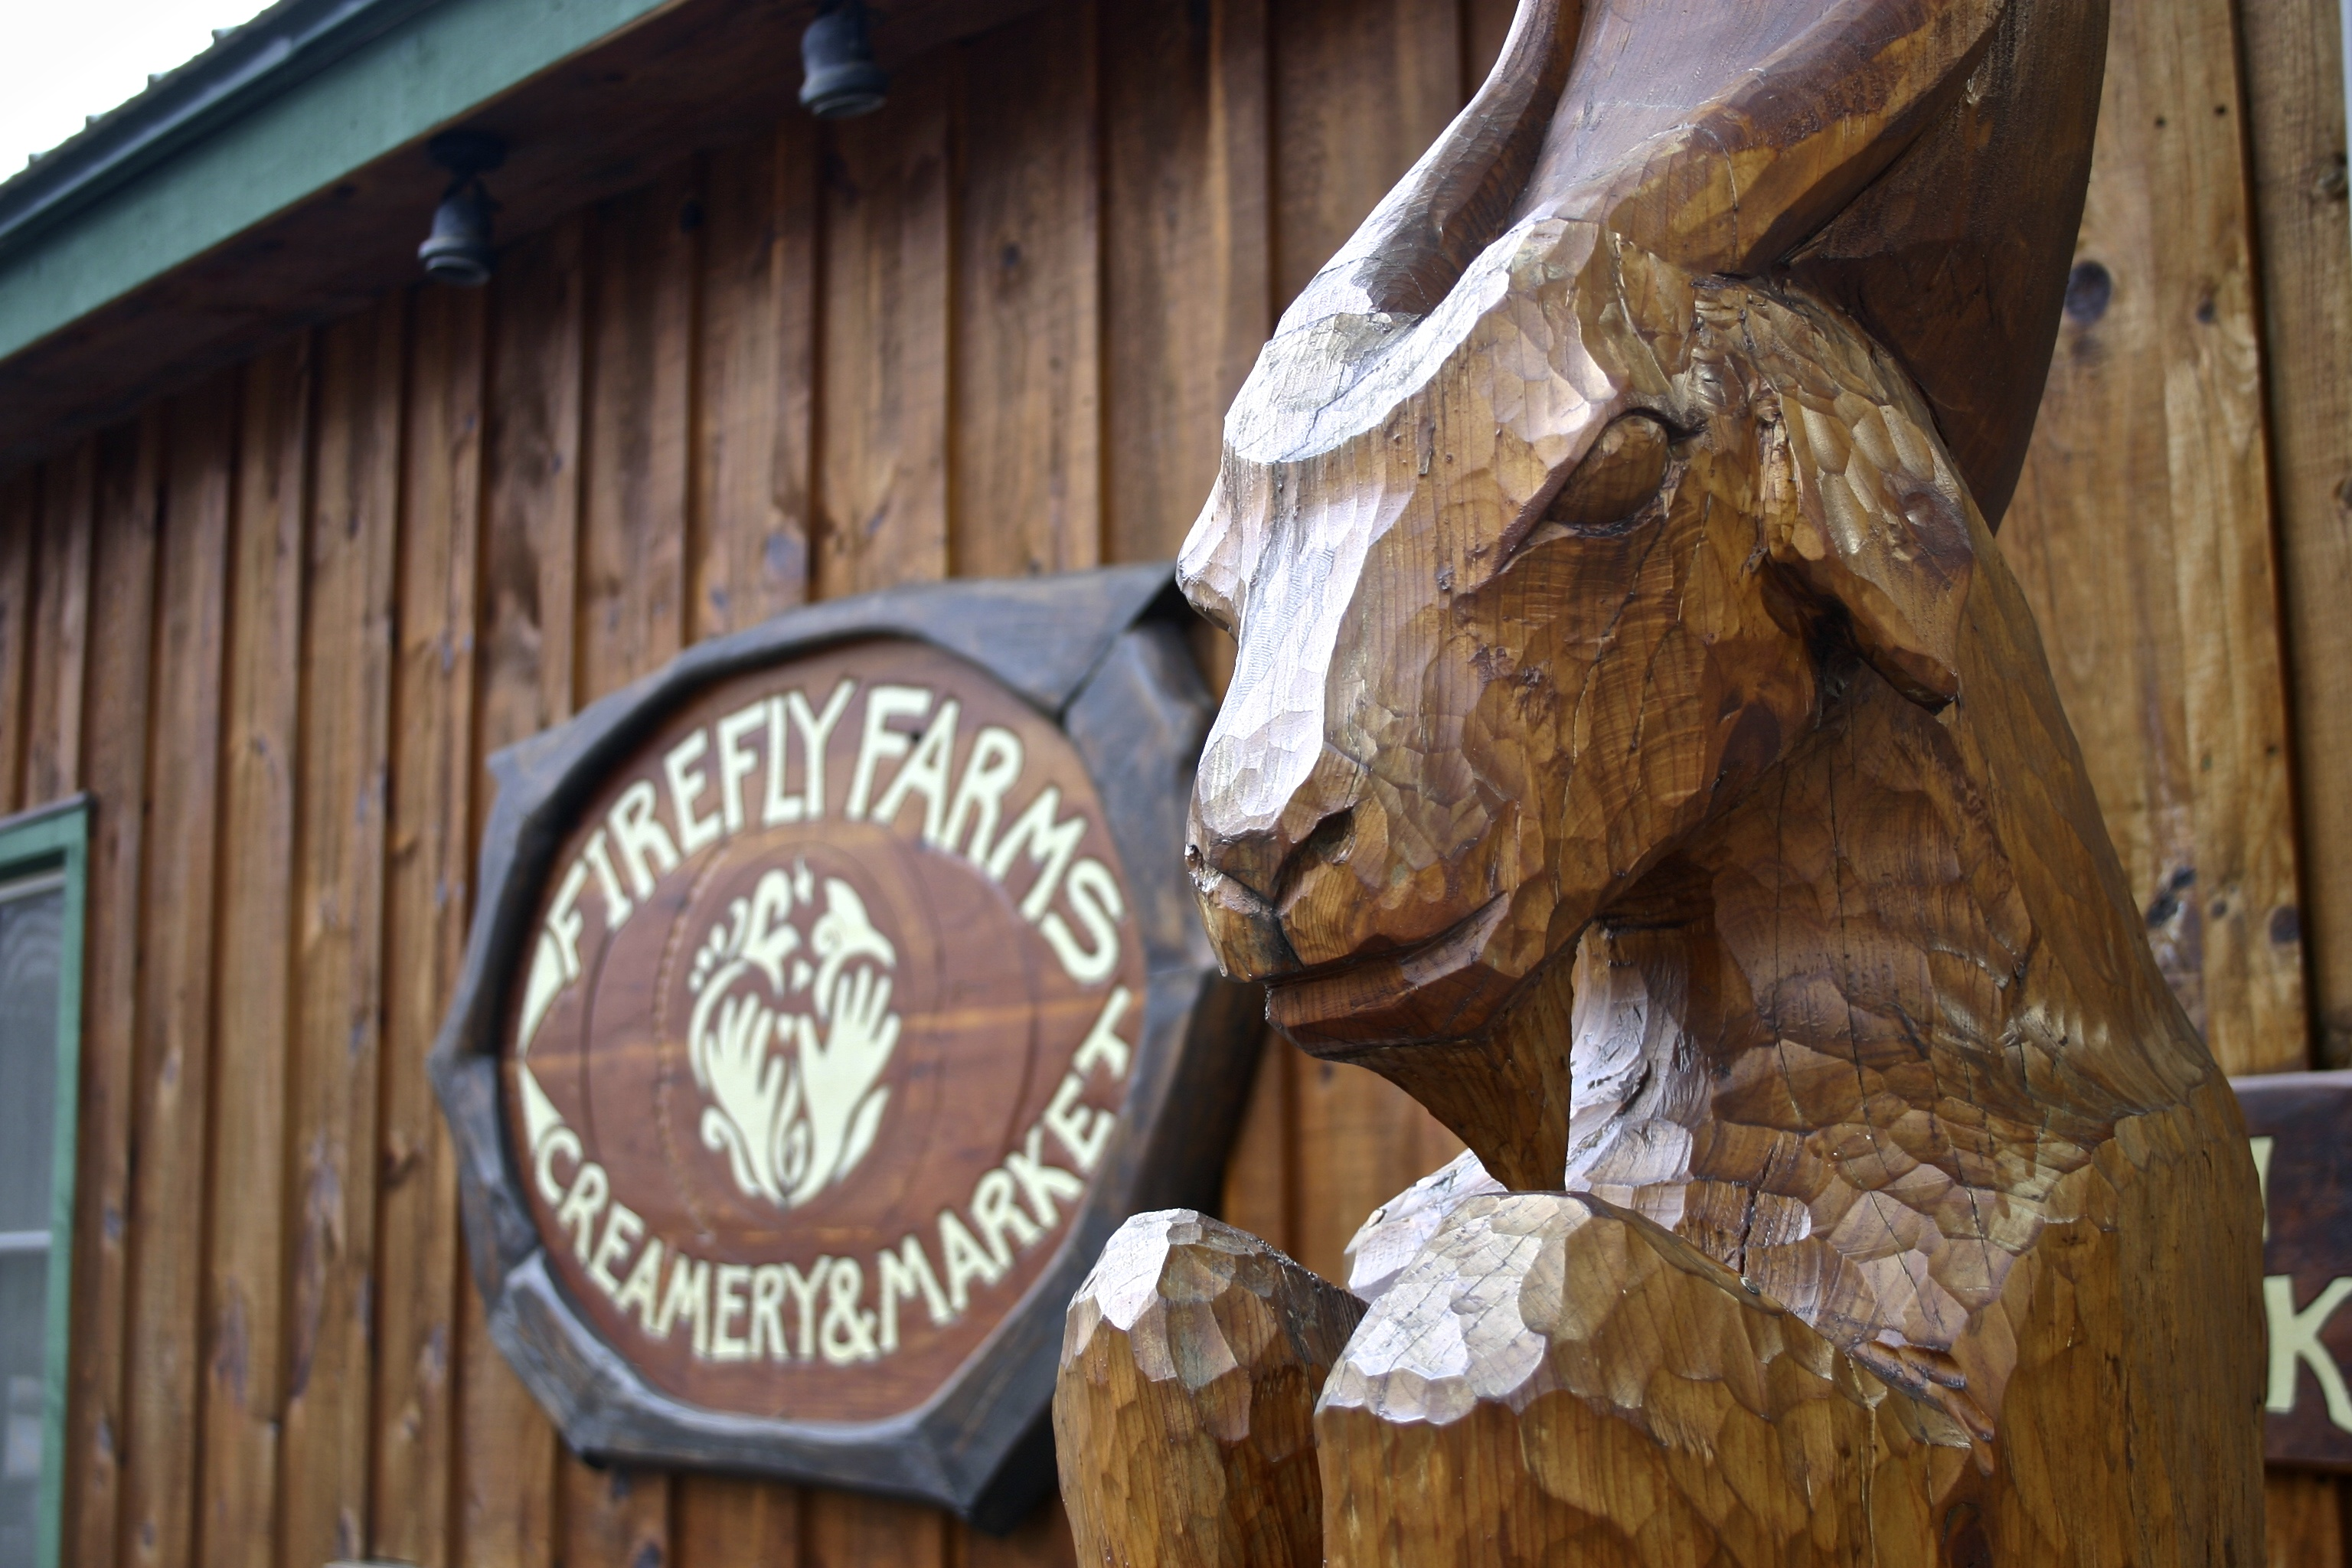 Local farm's 'kids' behind award-winning cheese